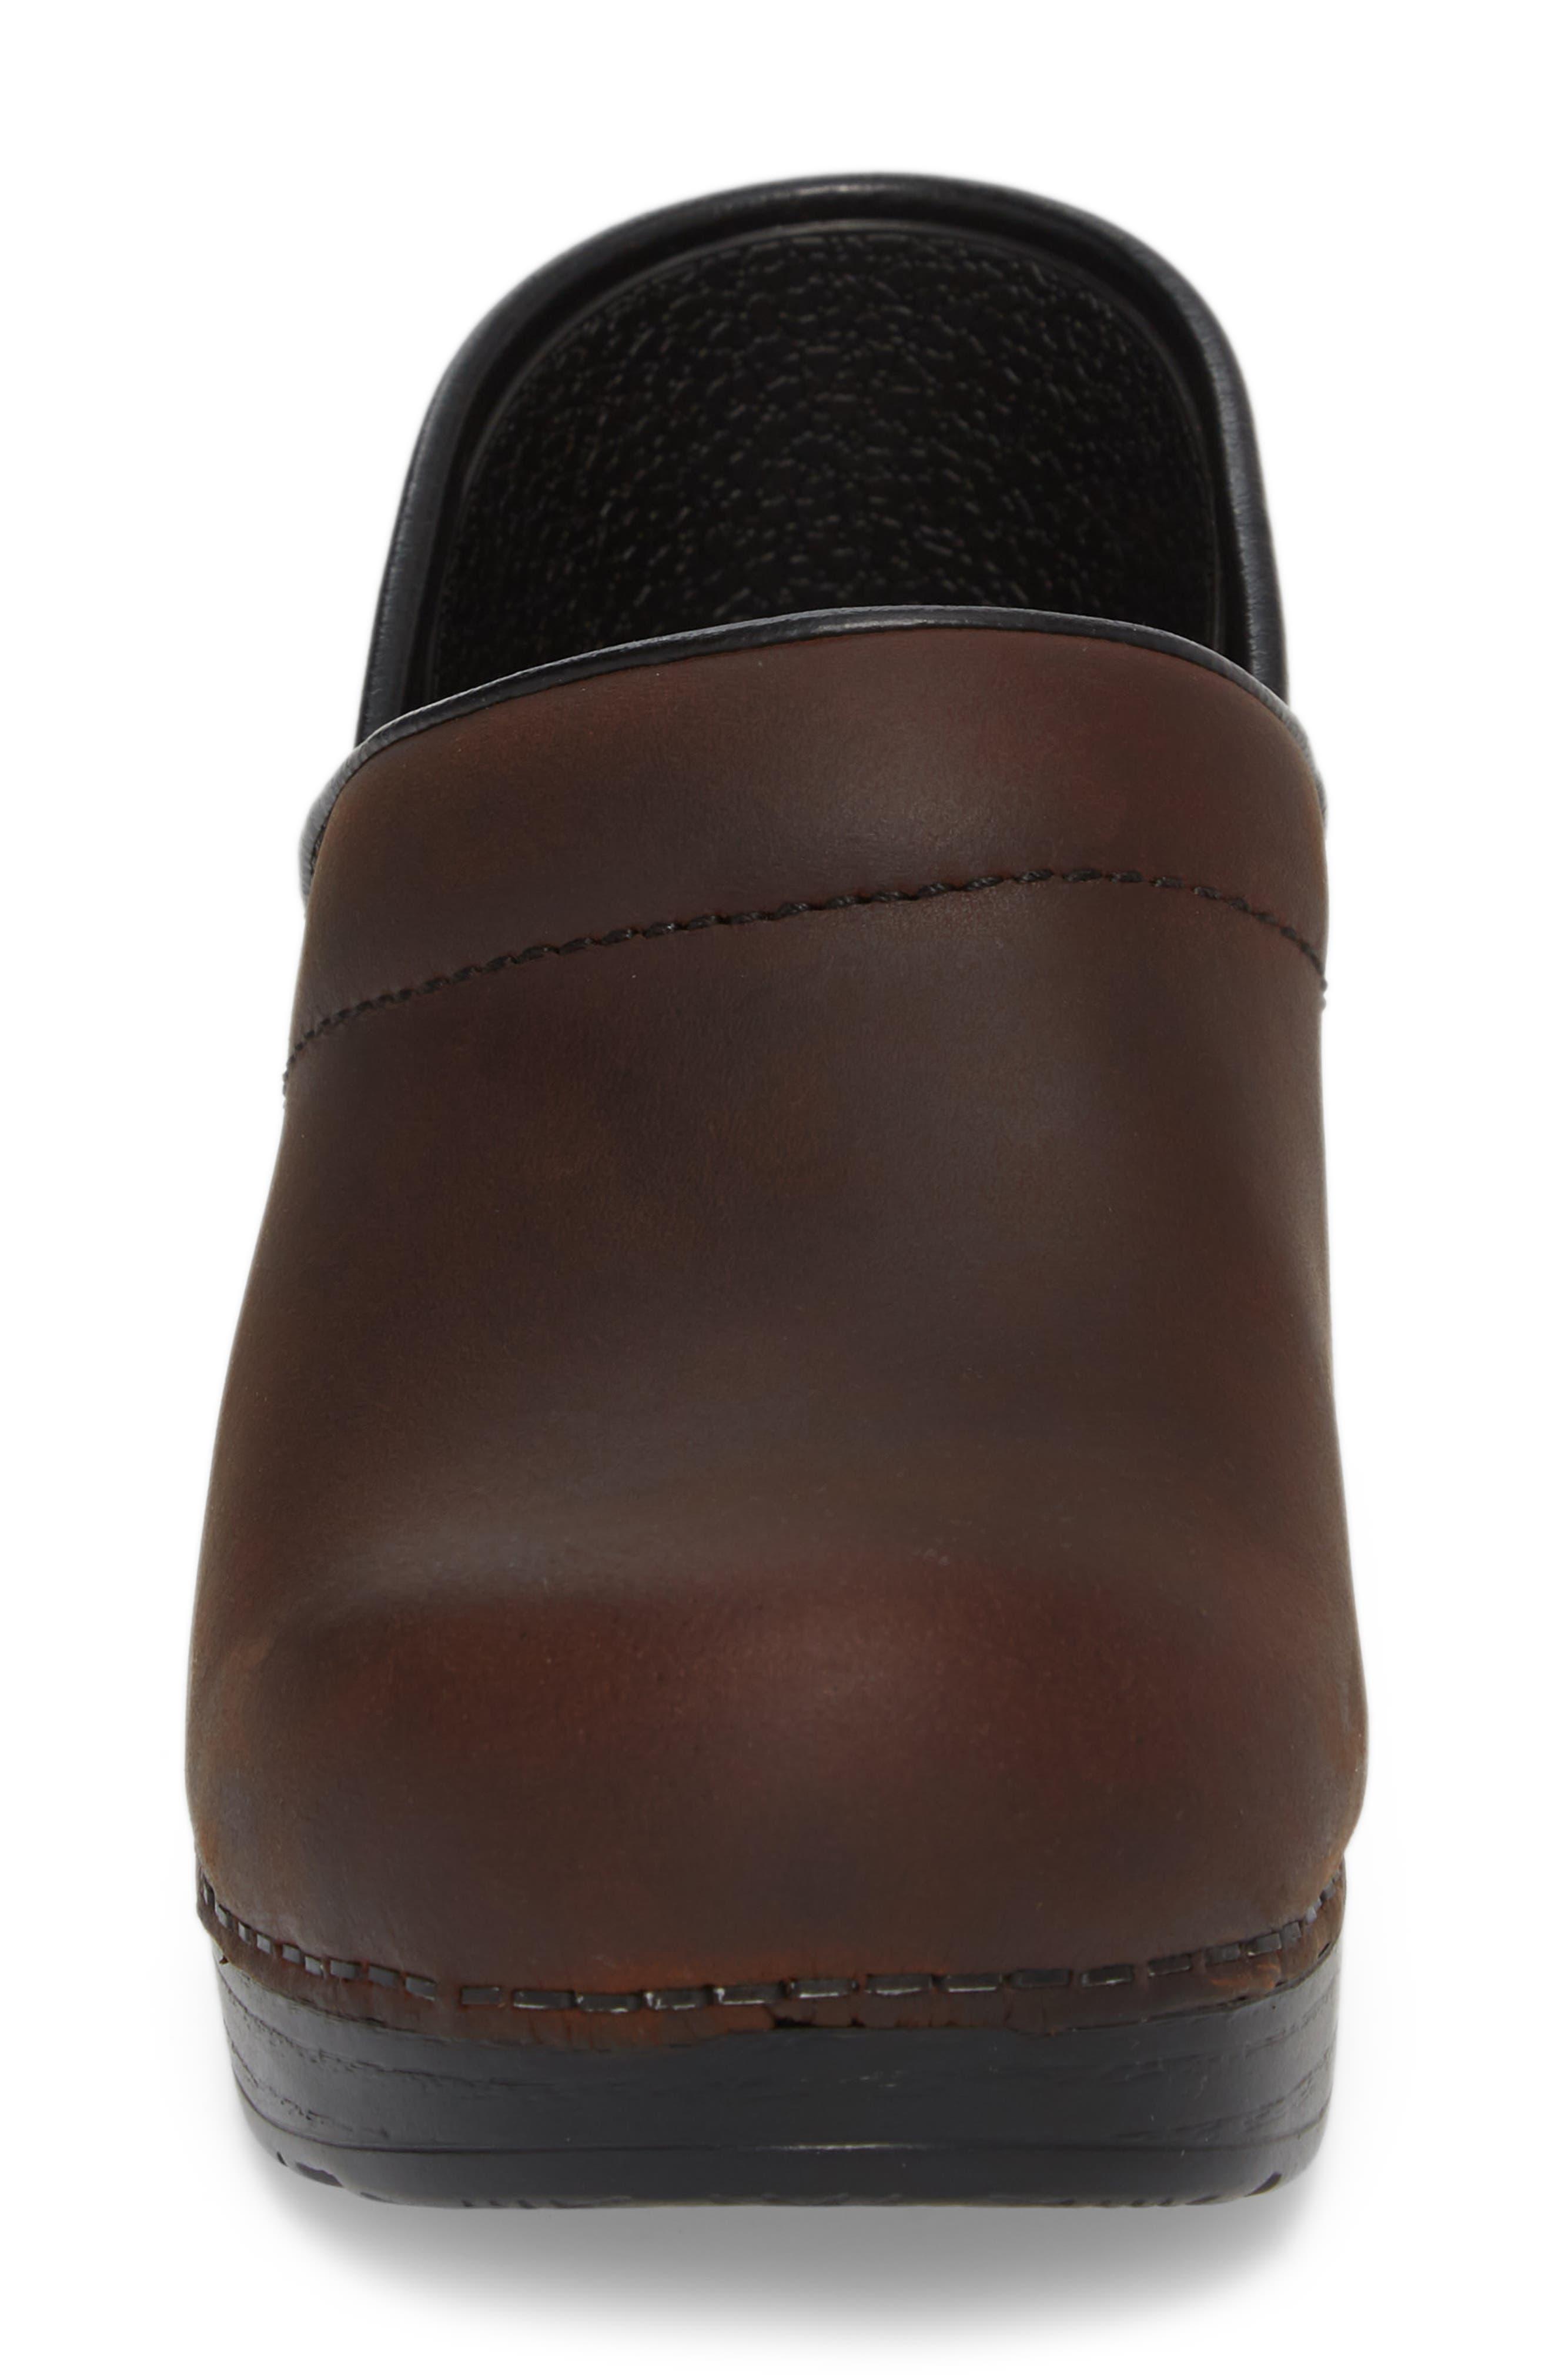 Wide Pro Clog,                             Alternate thumbnail 4, color,                             Antique Brown/ Black Leather